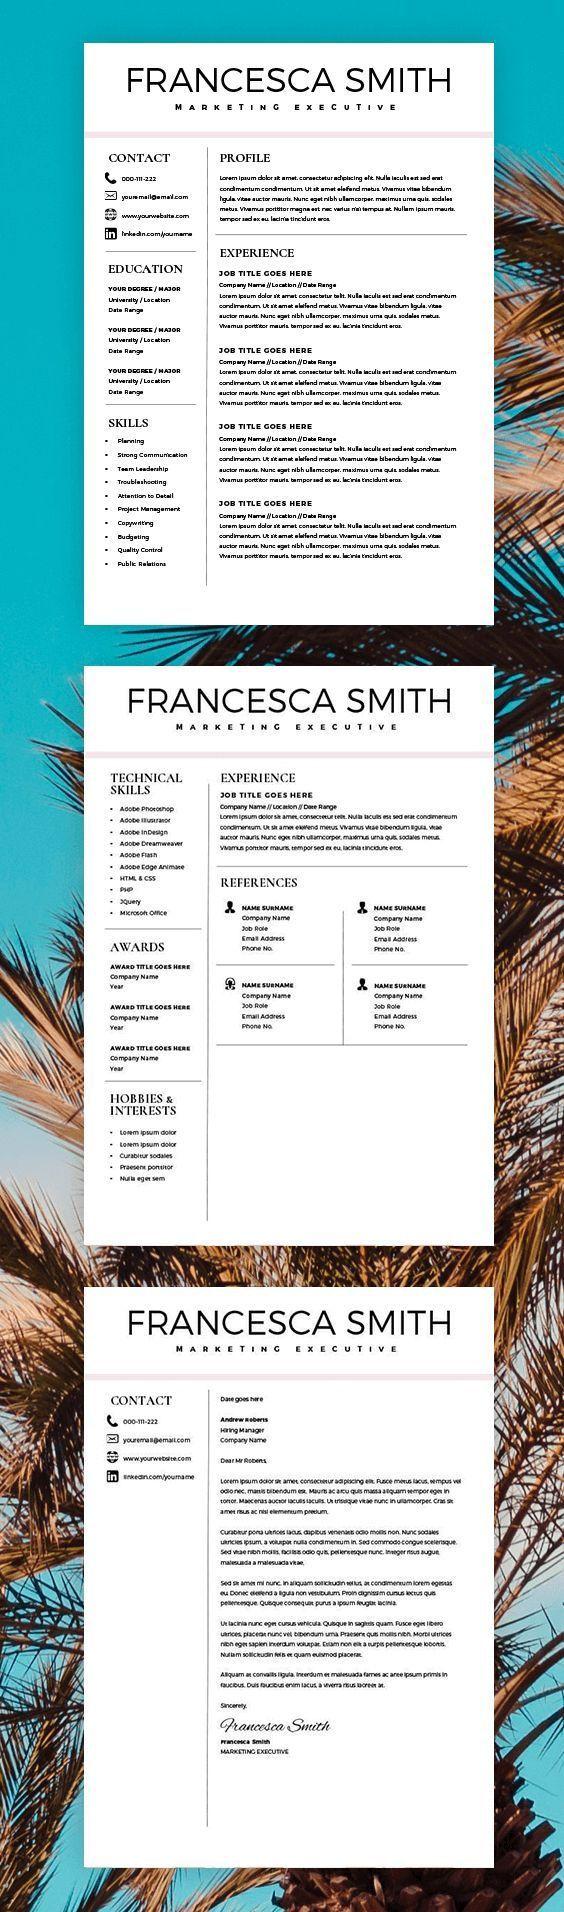 Best 25 Fashion Resume Ideas On Pinterest Internship Fashion